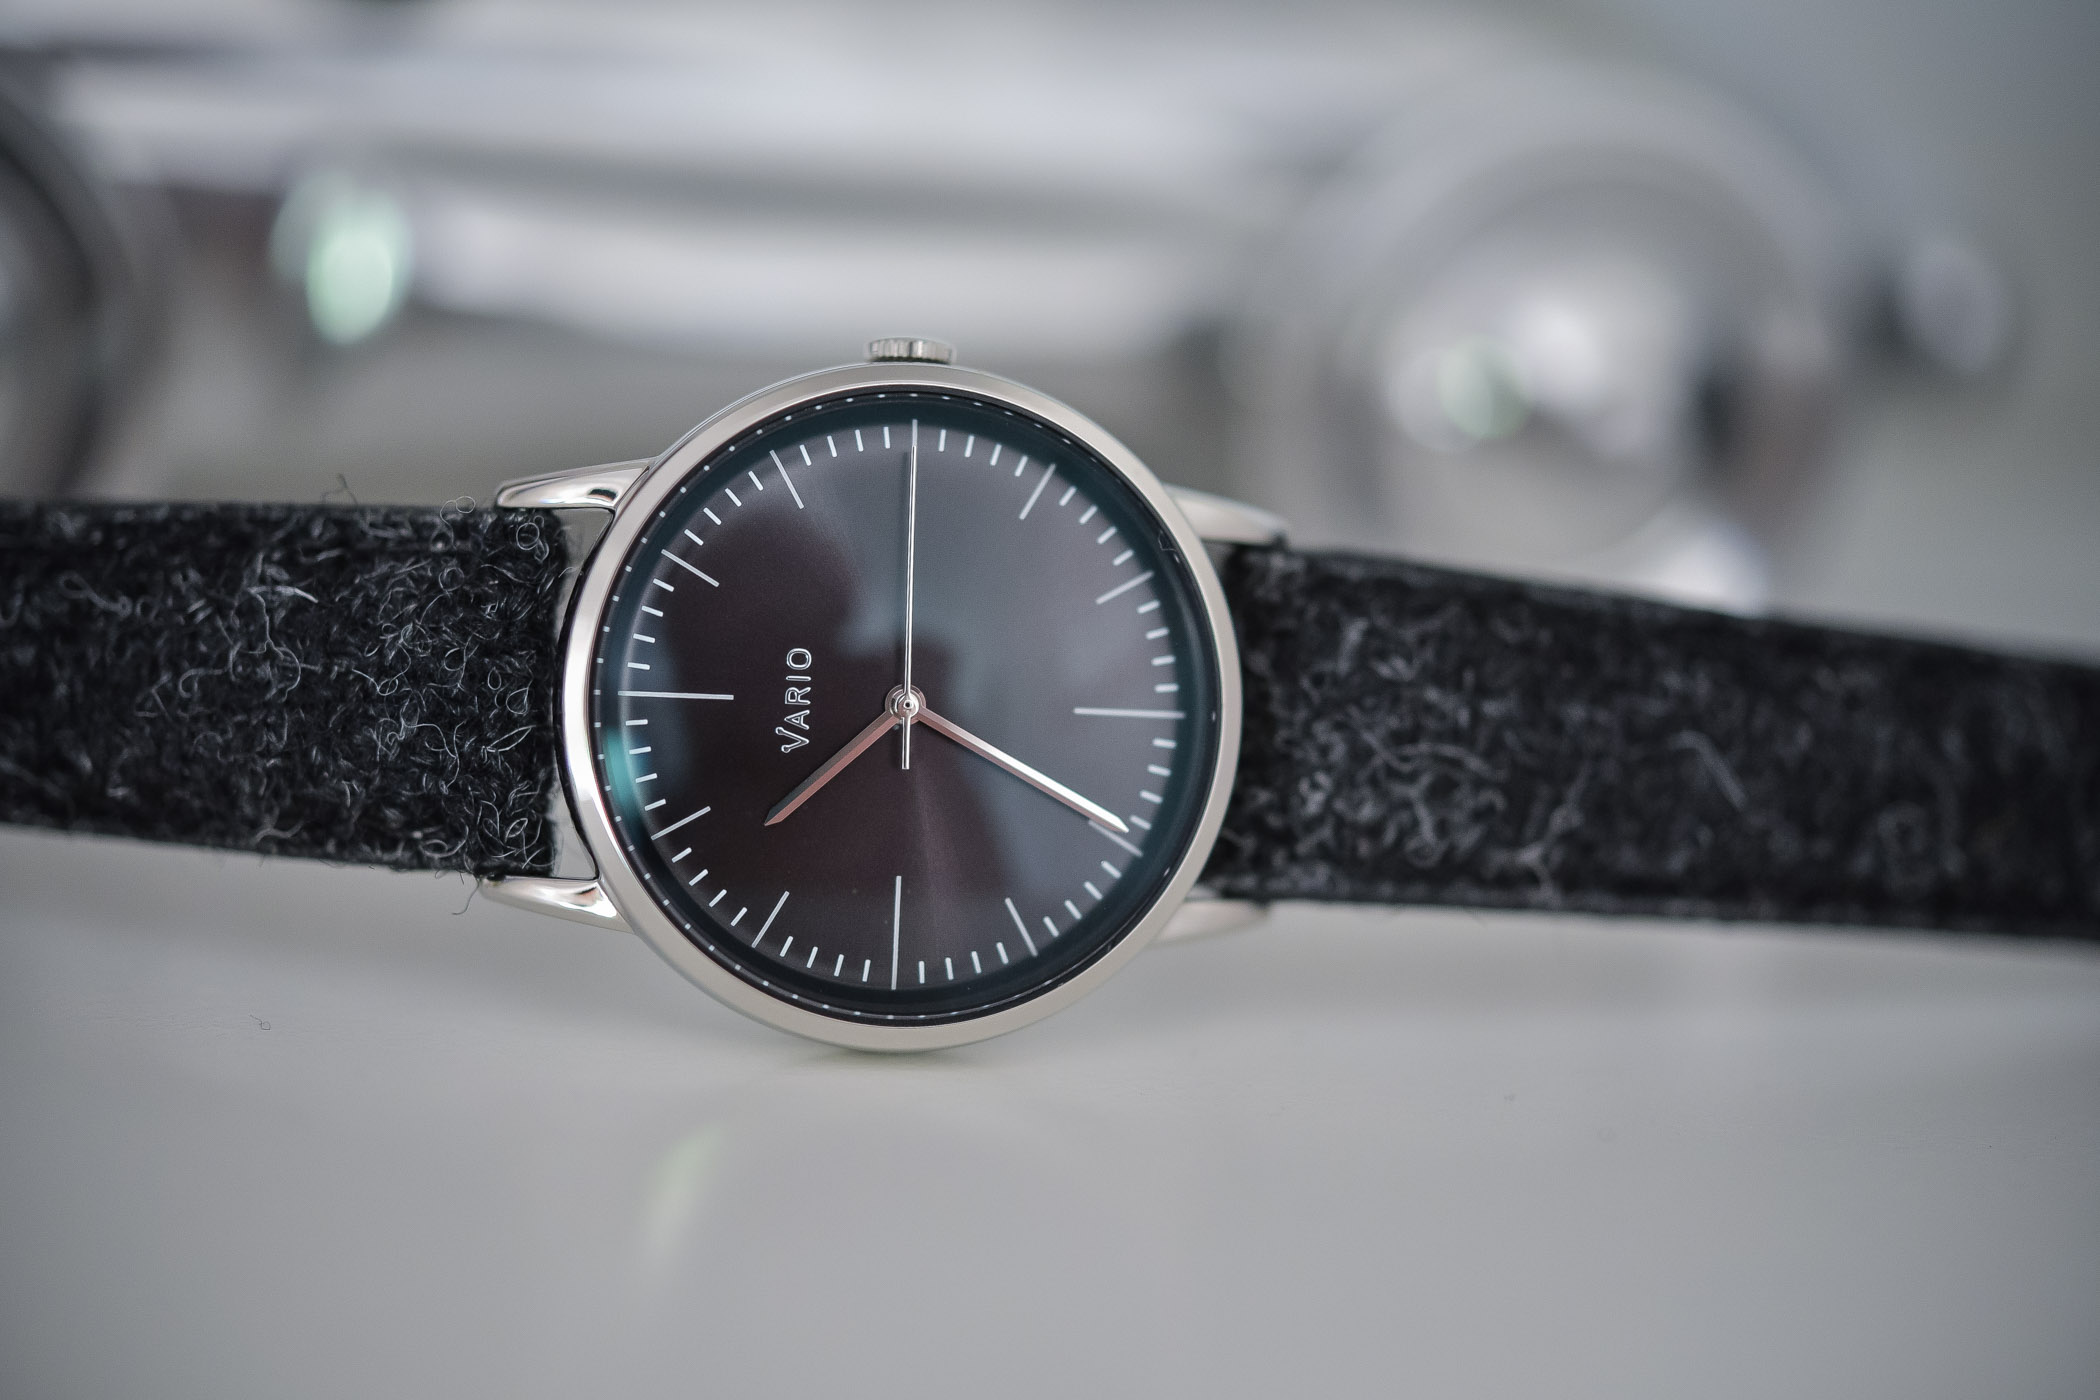 Vario Eclipse Watch hands-on